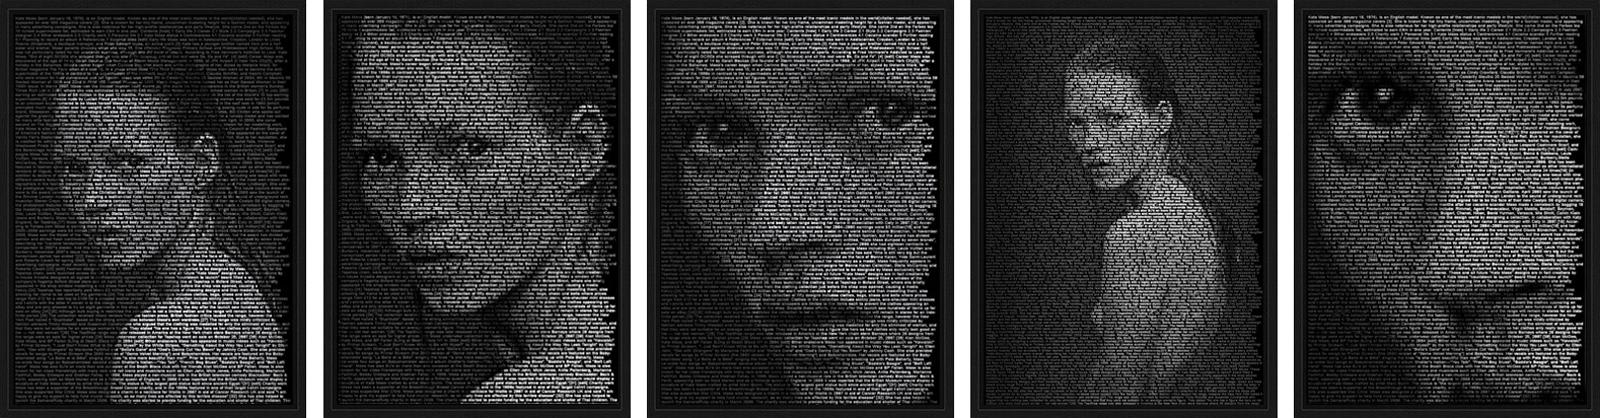 Kate sample - Ralph Ueltzhoeffer - Bilder, Fotografie, Foto Kunst online bei LUMAS - showimg_rue35_1600_1600